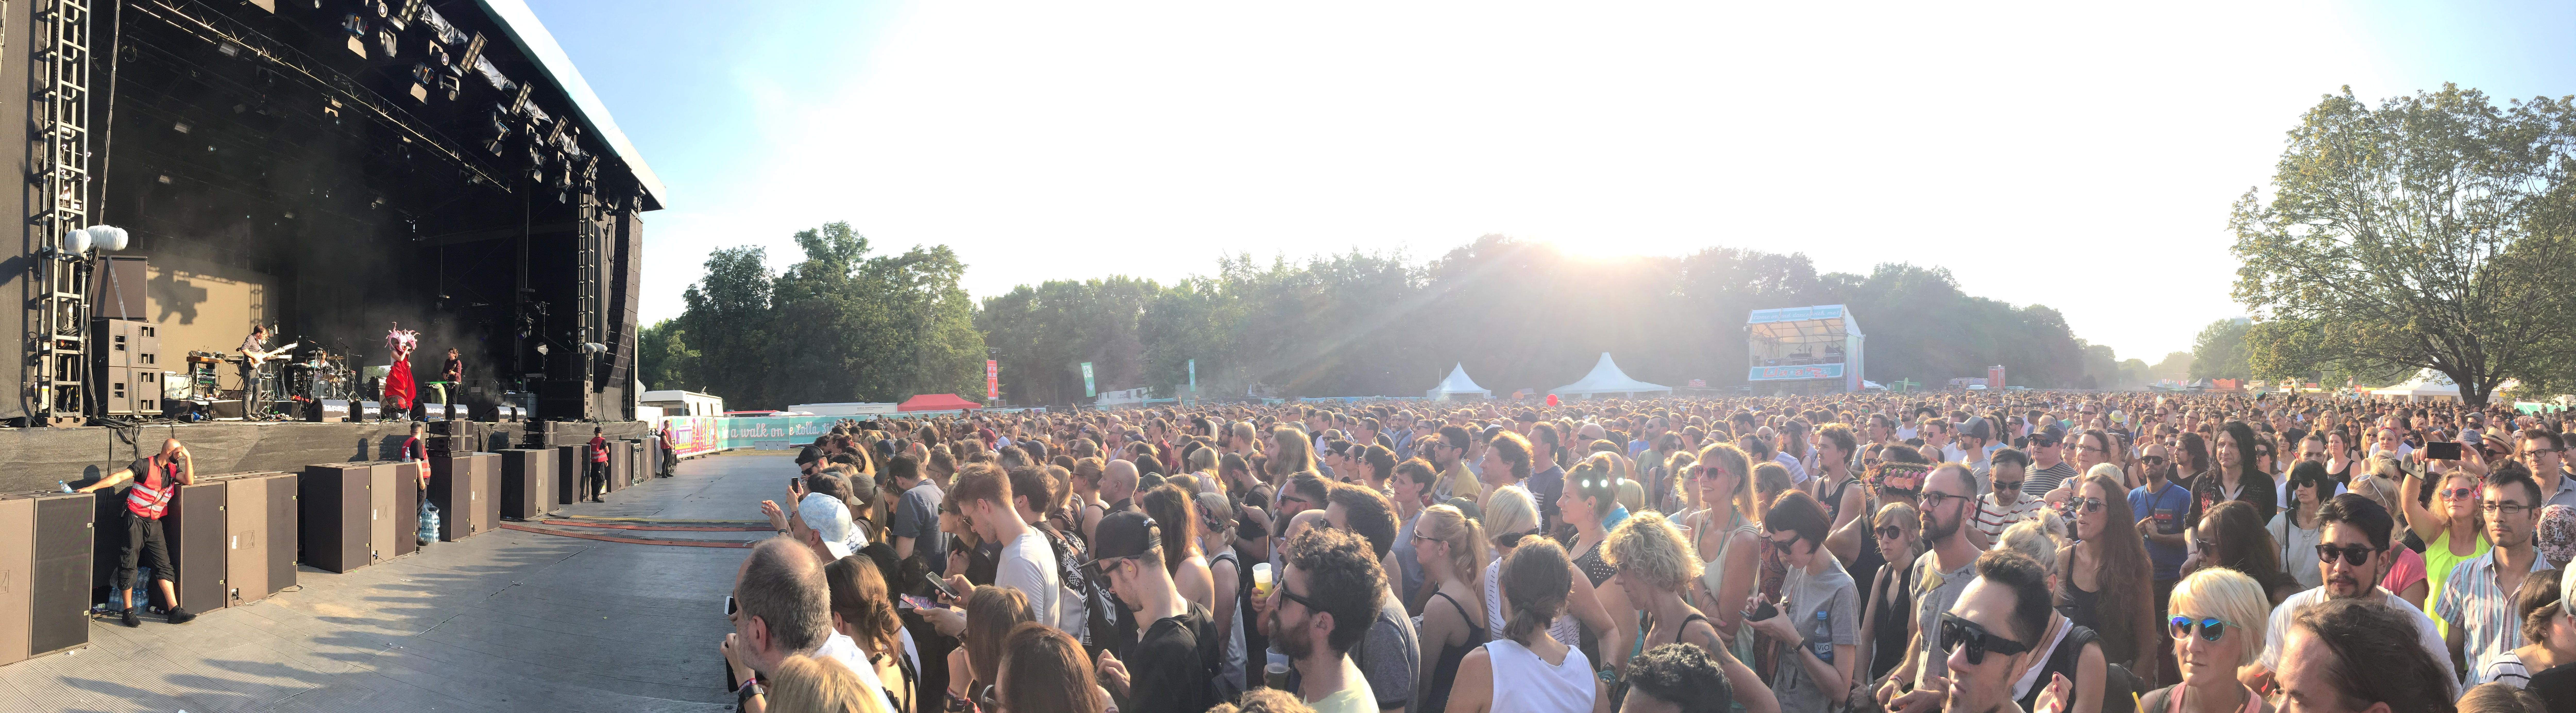 Róisín Murphy @Lollapalooza Berlin 2016